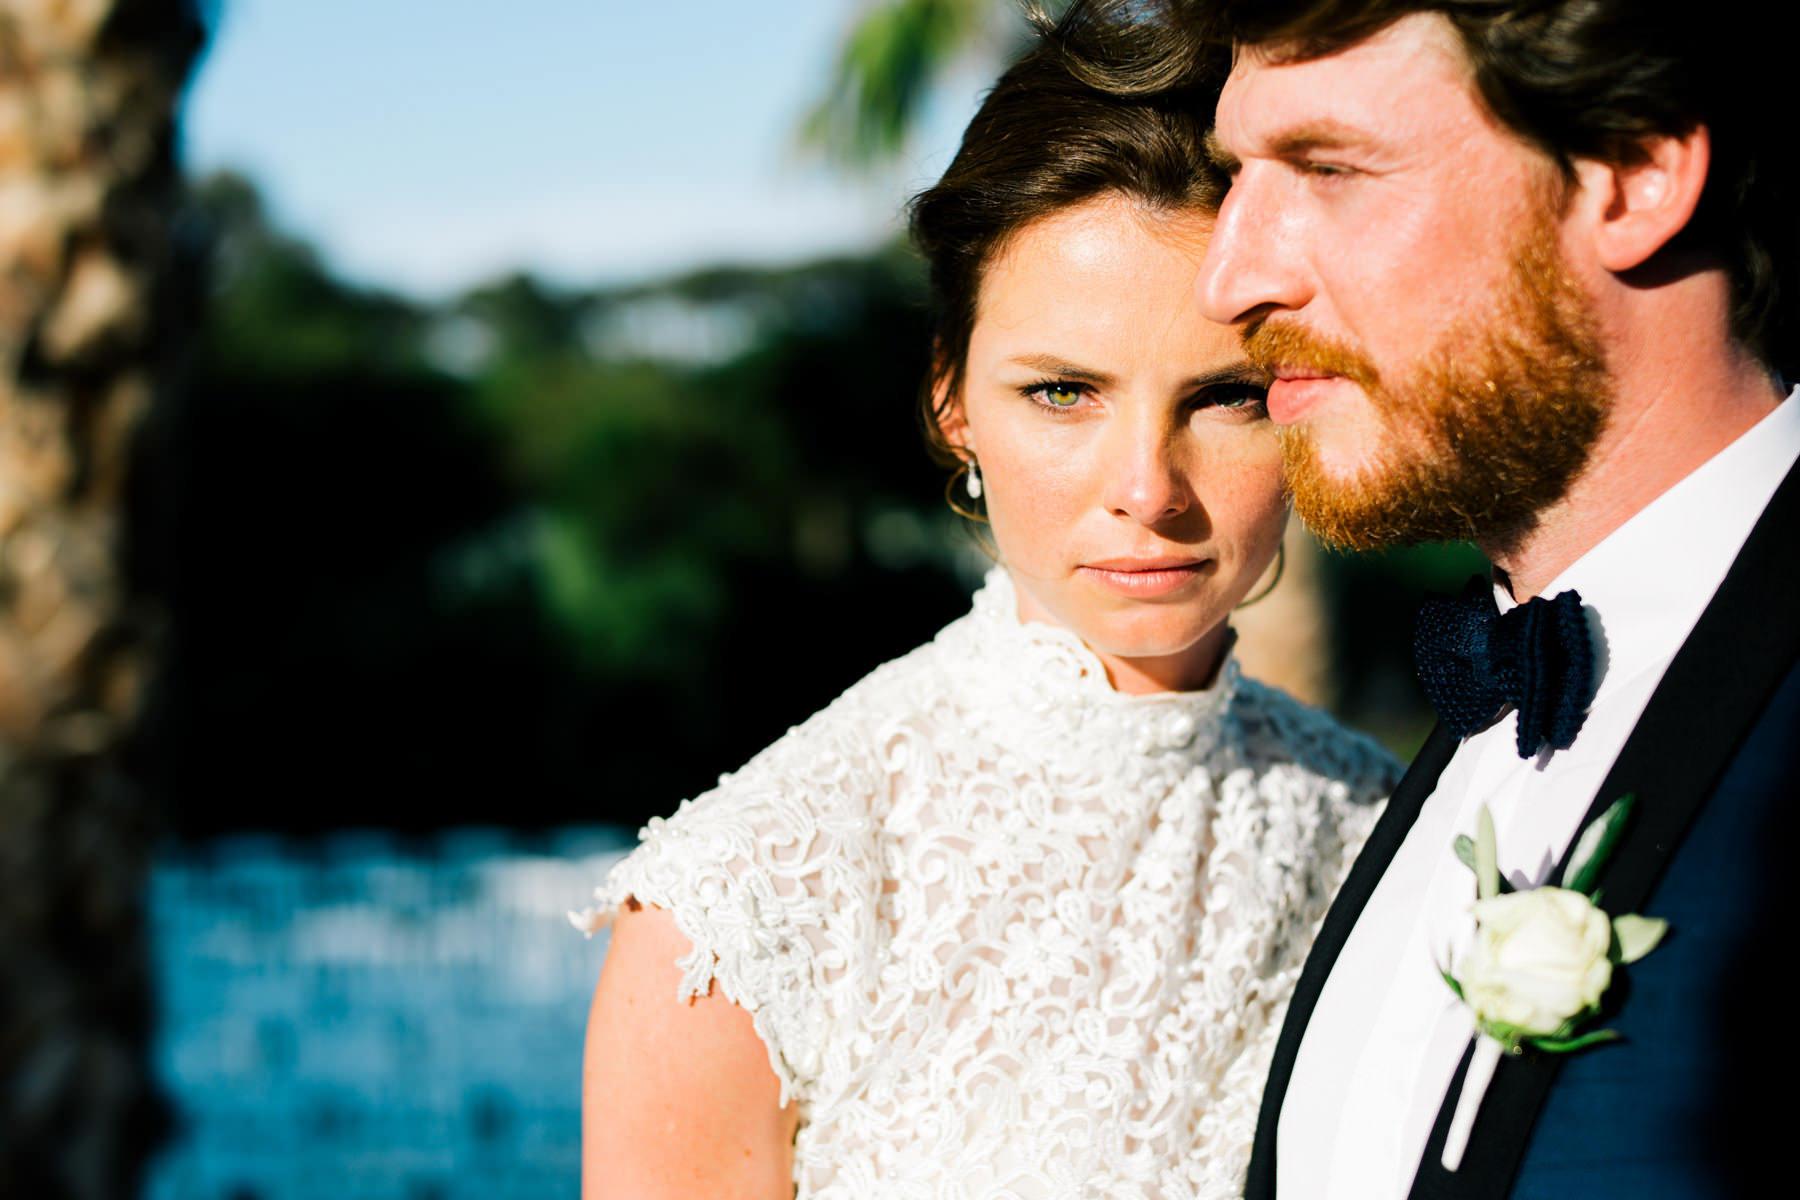 narracia-wygledacz-photographe-mariage-portfolio-50.jpg